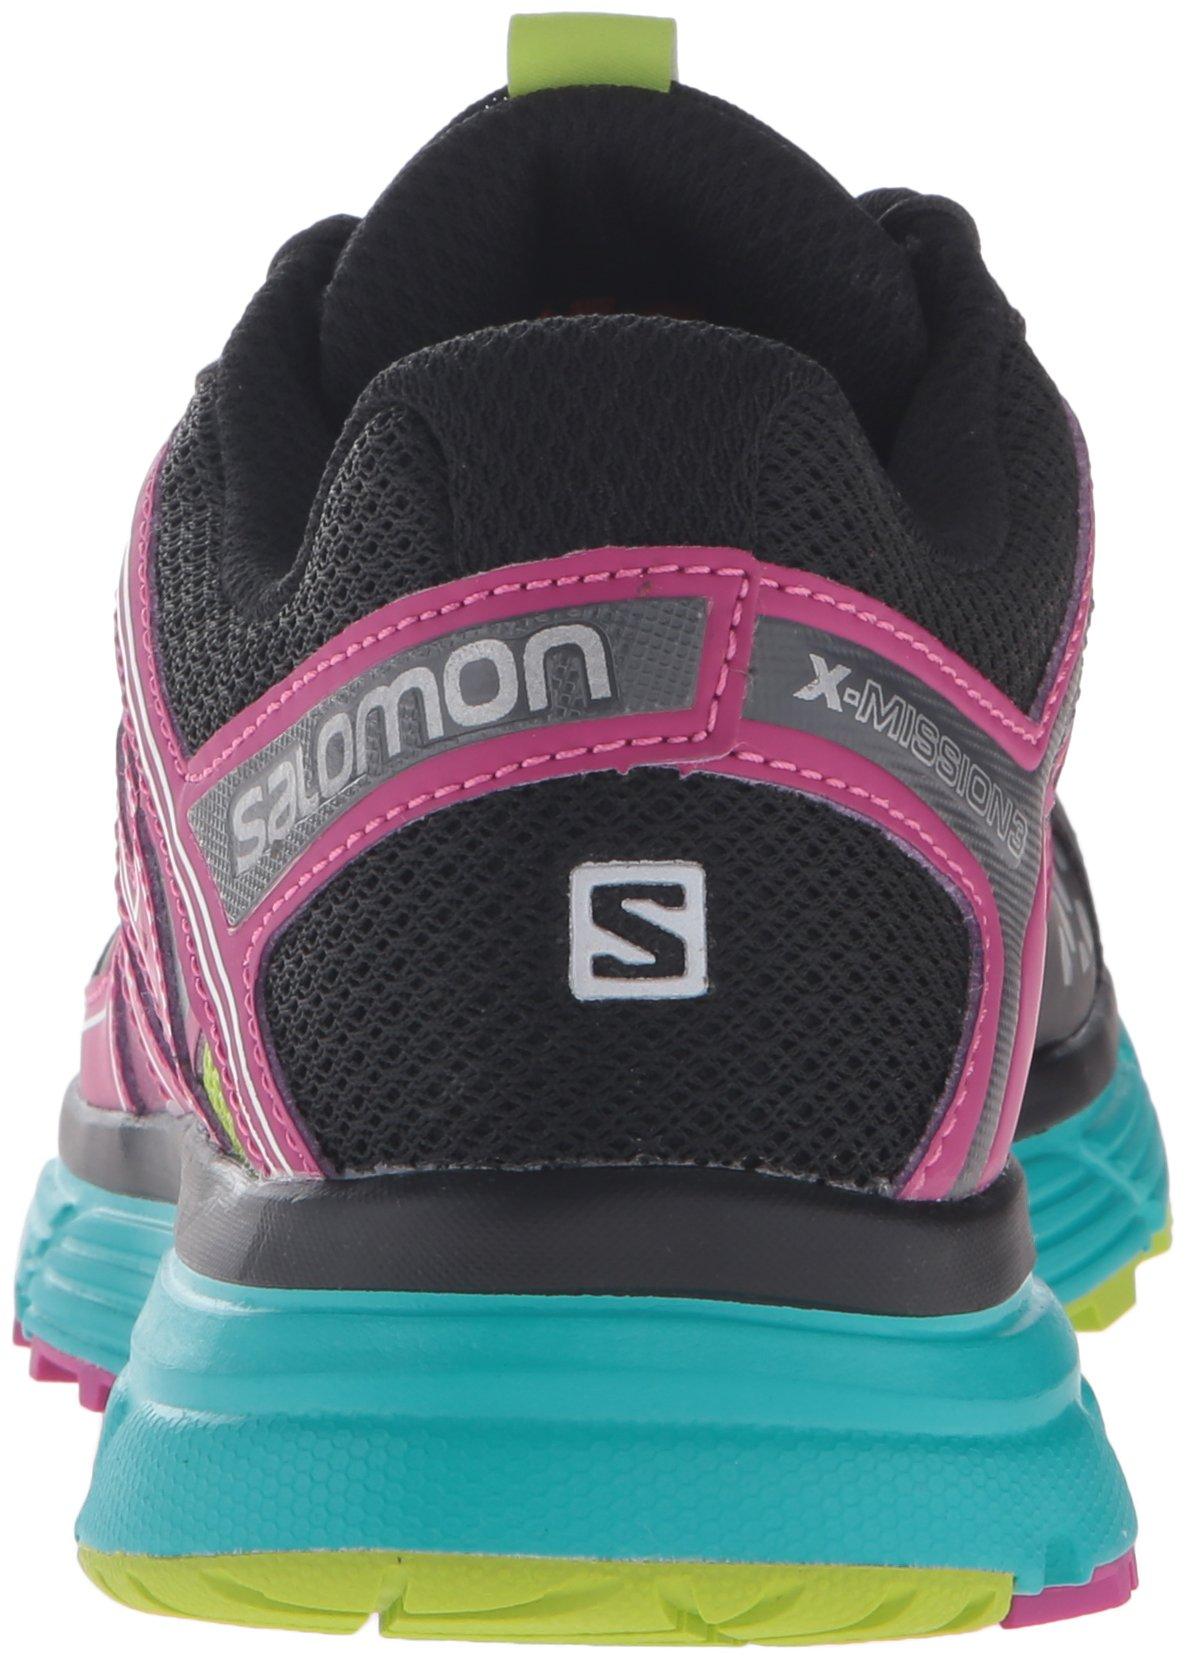 Salomon Women's X-Mission 3 CS W Trail Runner, Black/Teal Blue F/Deep Dahlia, 11 D US by Salomon (Image #2)